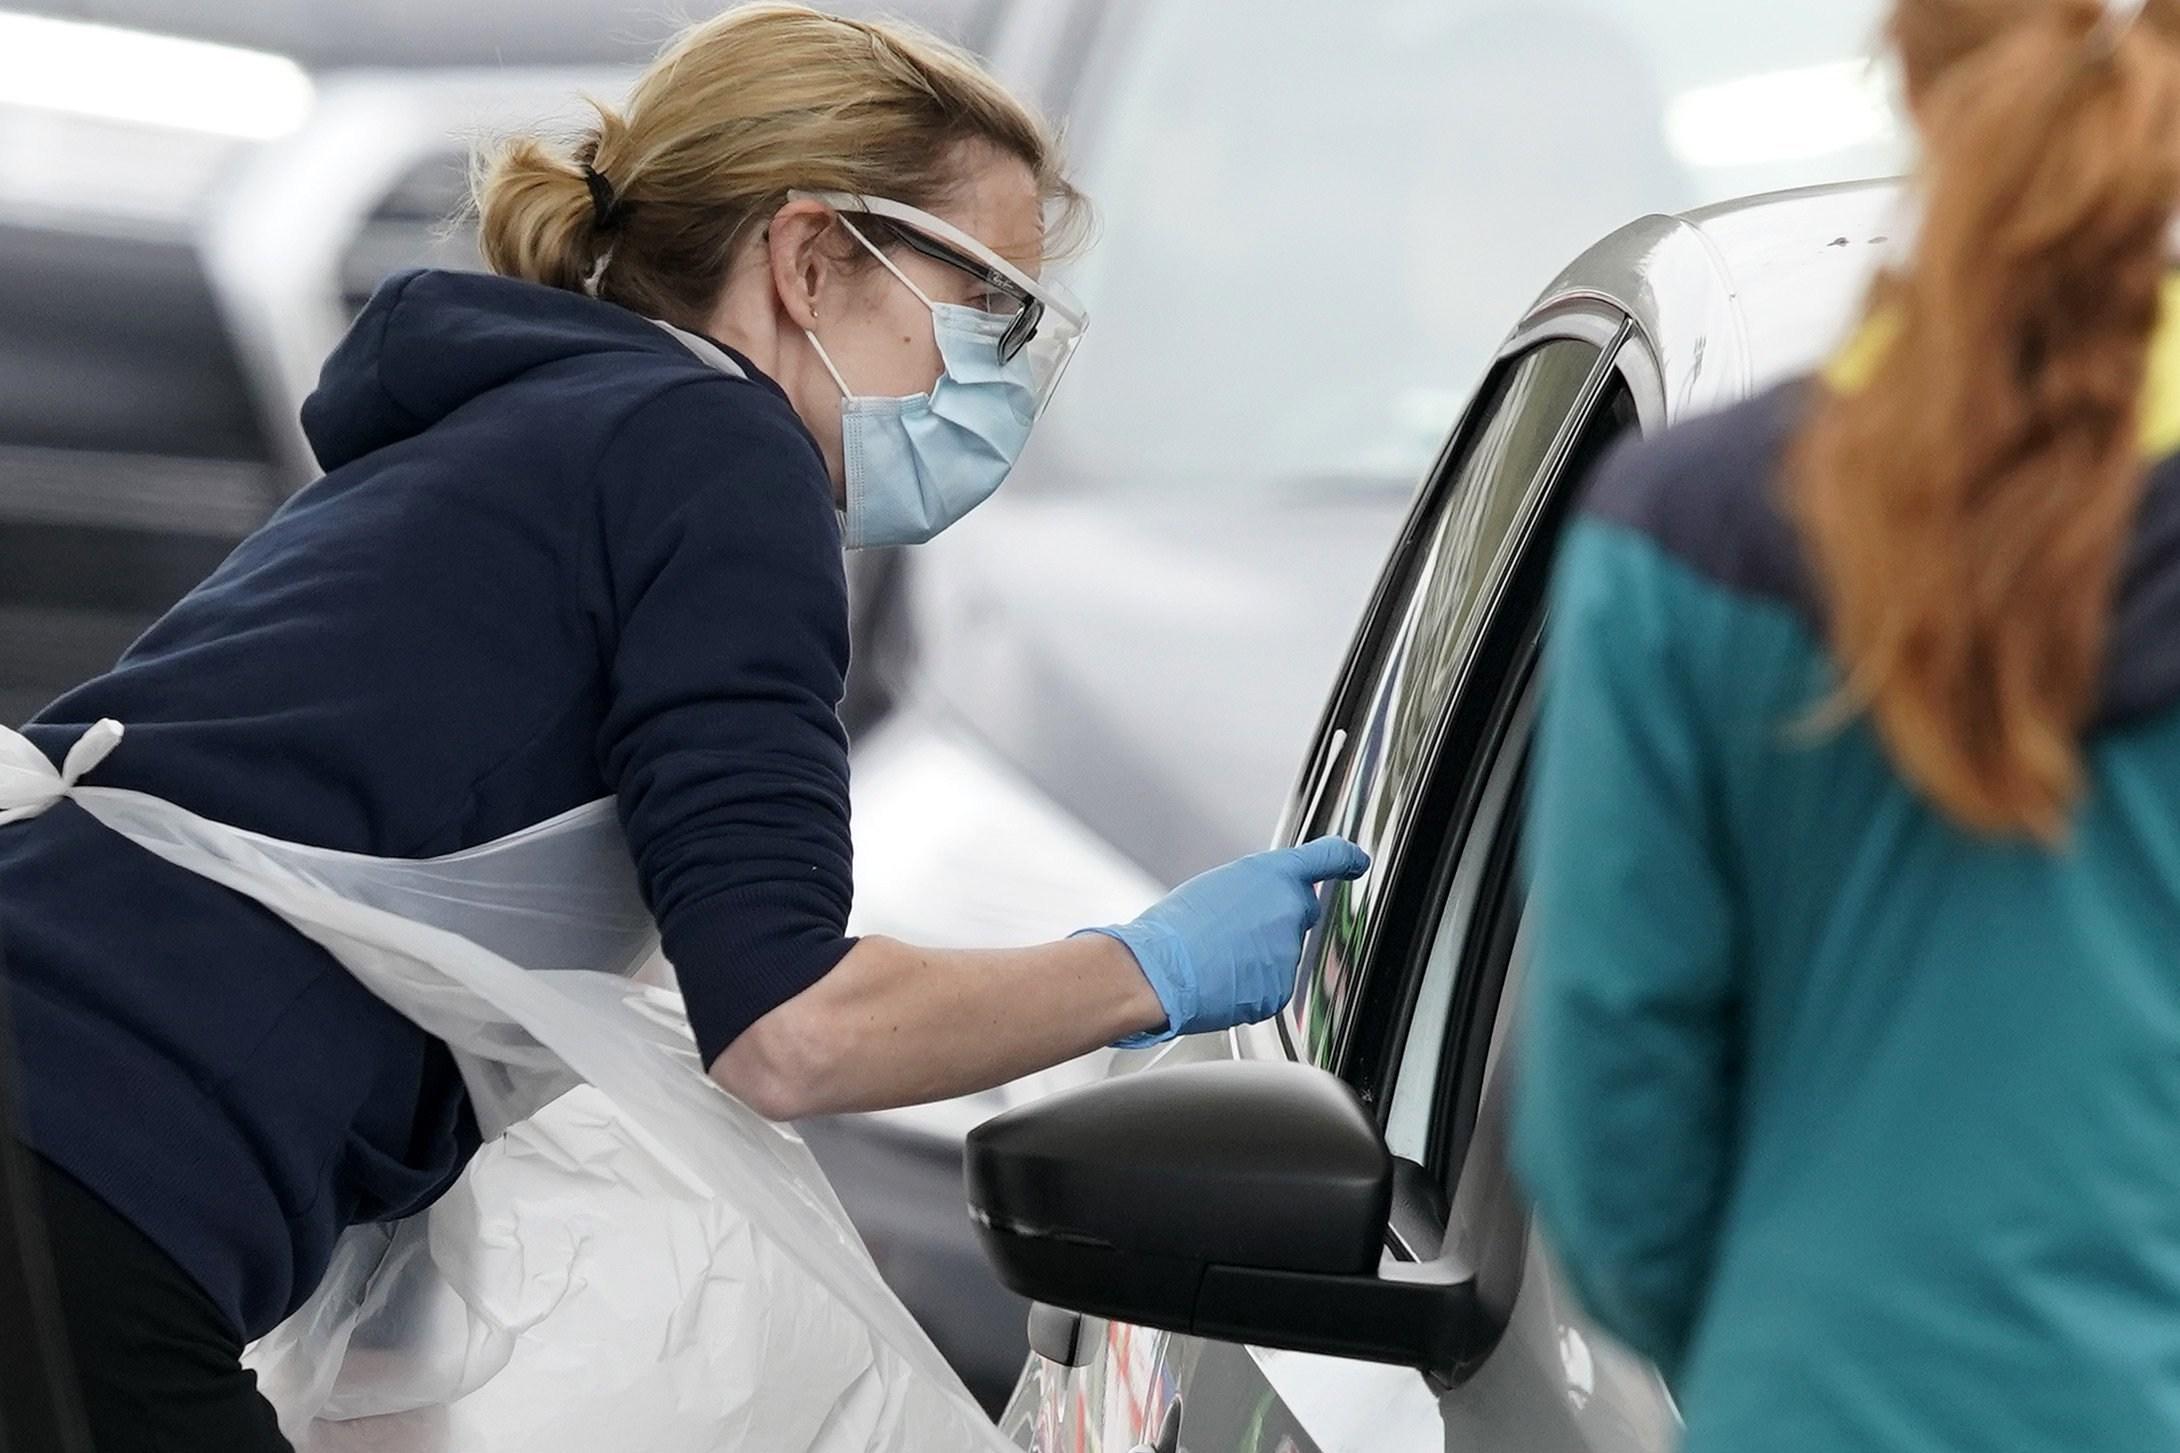 At least 19 NHS heroes have died due to coronavirus